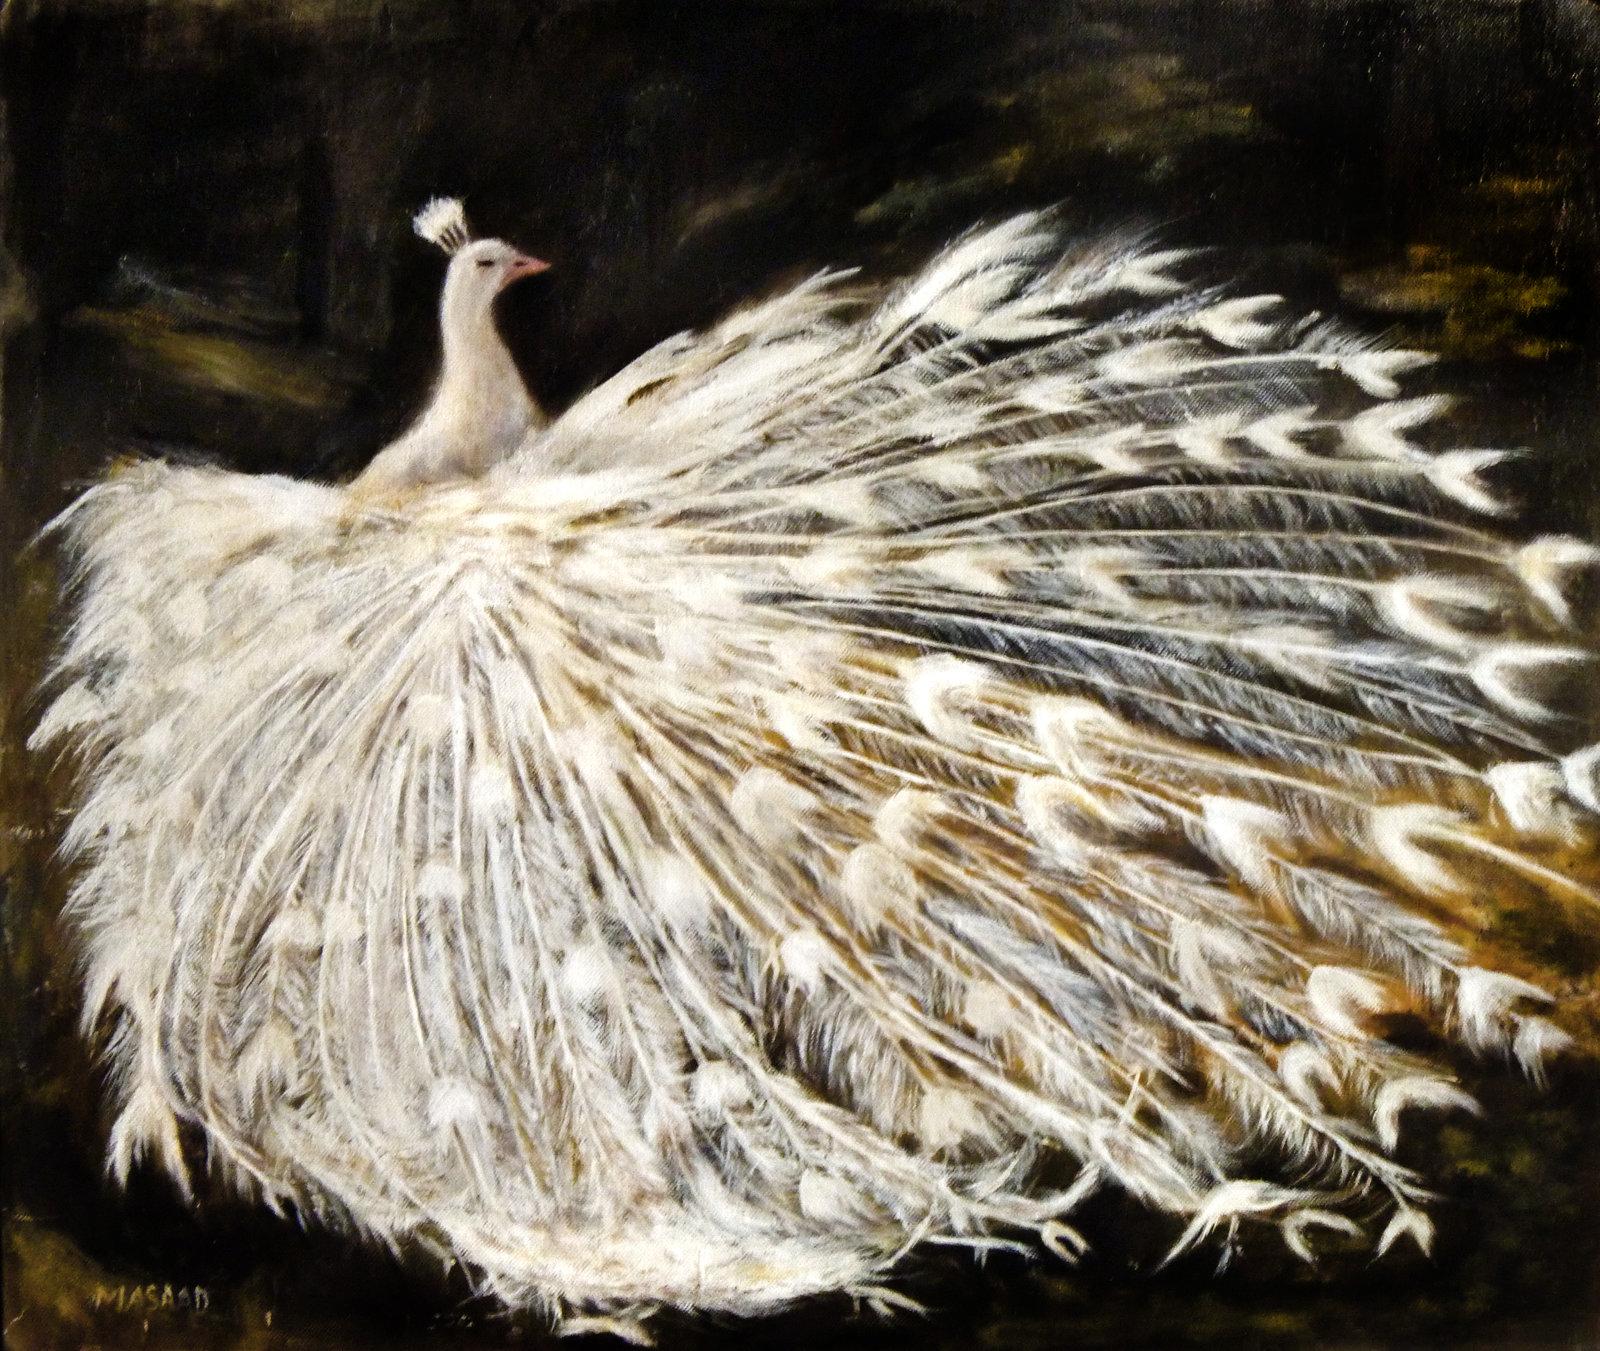 White Peacock by Massad